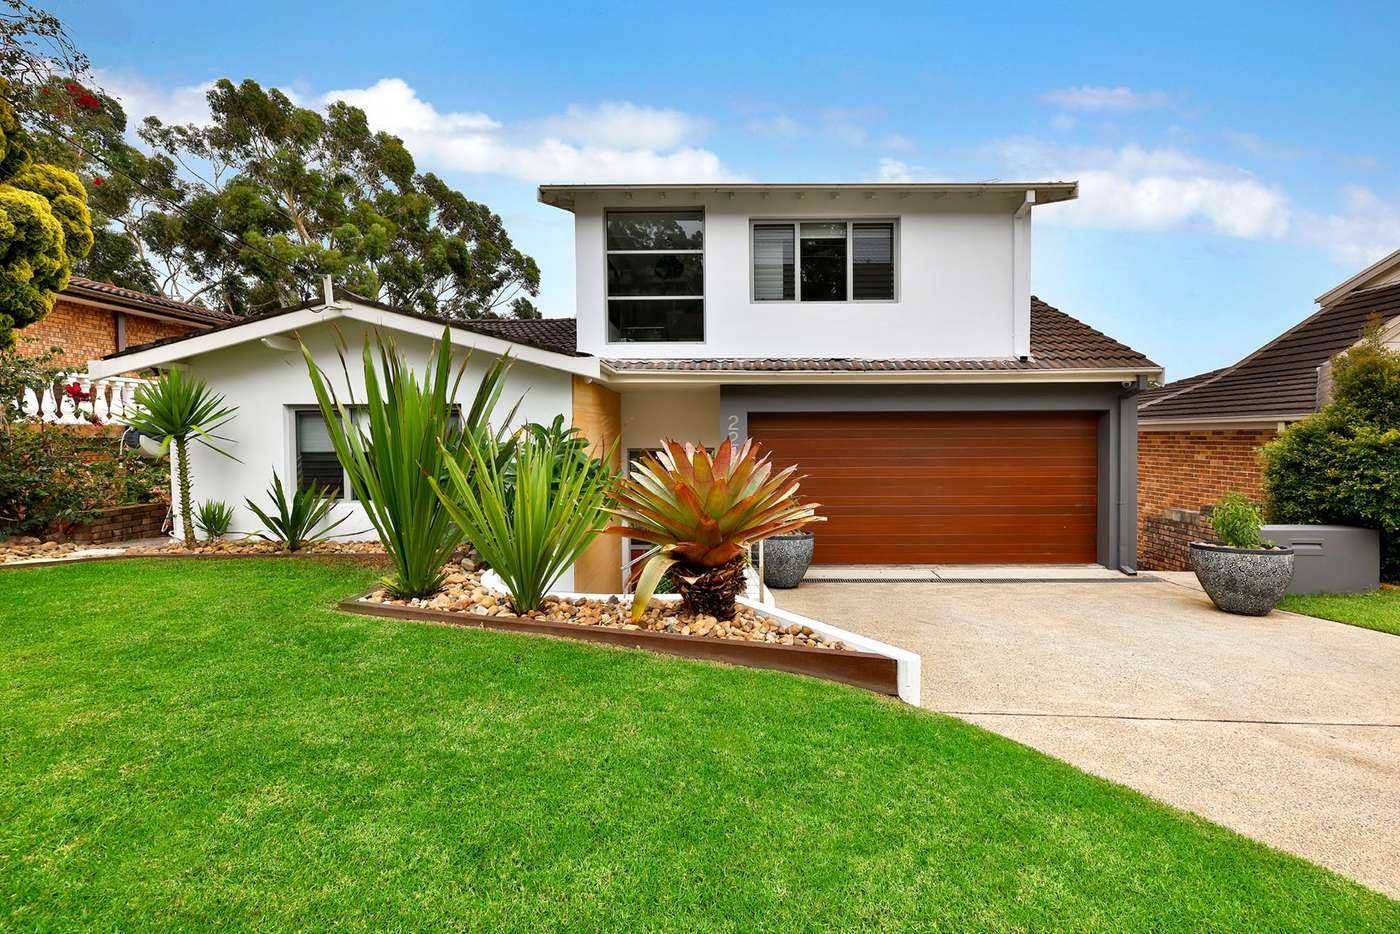 Main view of Homely house listing, 22 Ingrid Road, Kareela NSW 2232